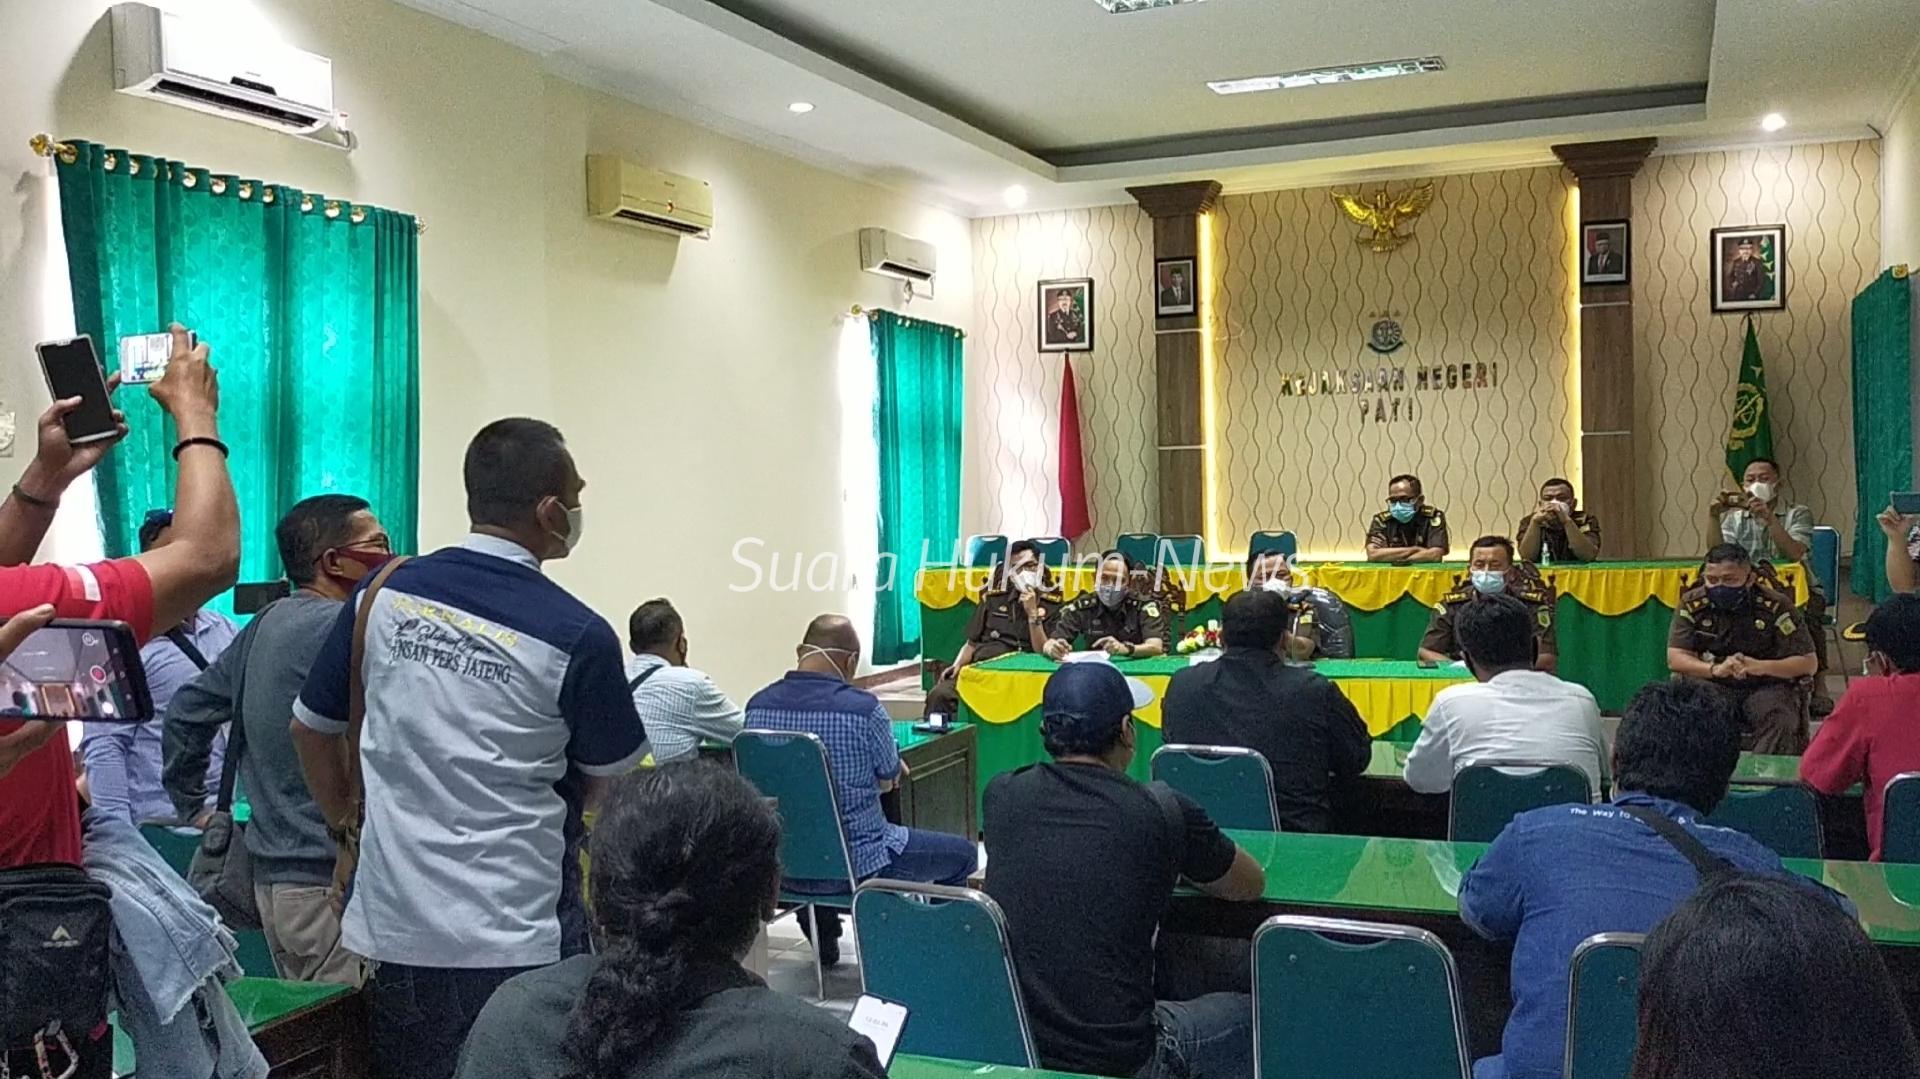 Diduga Rendahkan Profesi Wartawan & Fungsi LSM, Solidaritas Aktivis datangi Kantor Kajari Pati